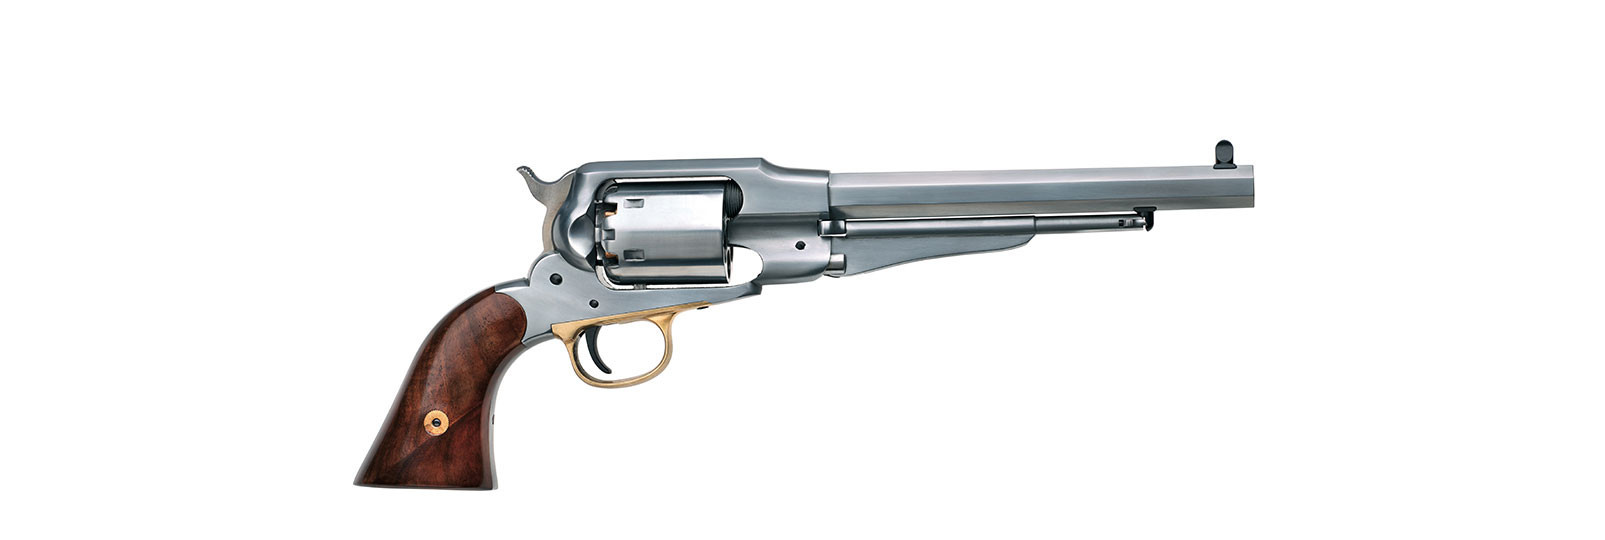 "Remington Pattern Revolver ""PEDERSOLI TARGET"" Custom"